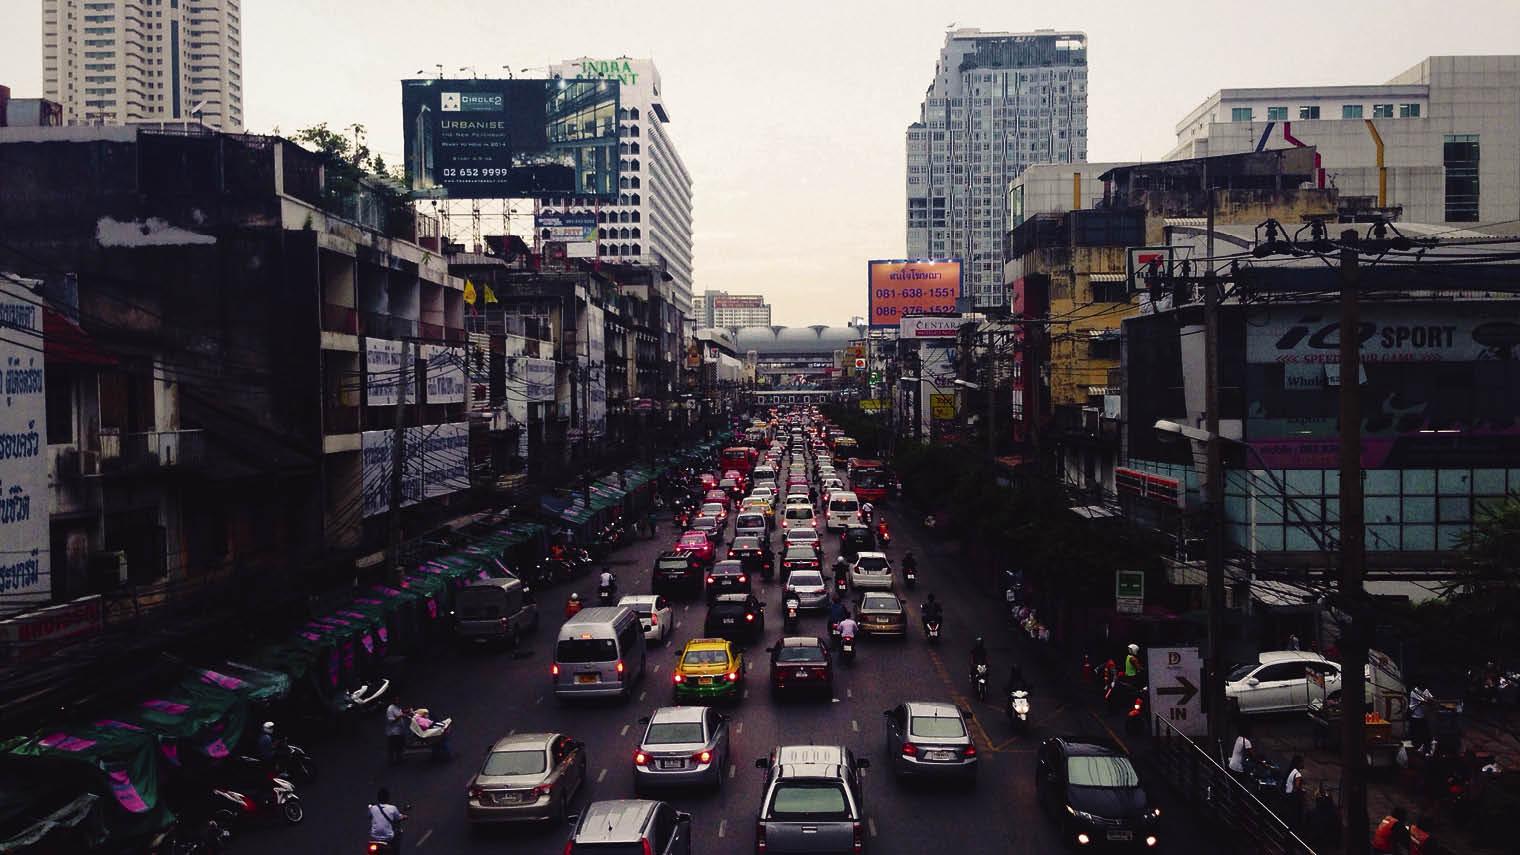 Busy city street full of traffic